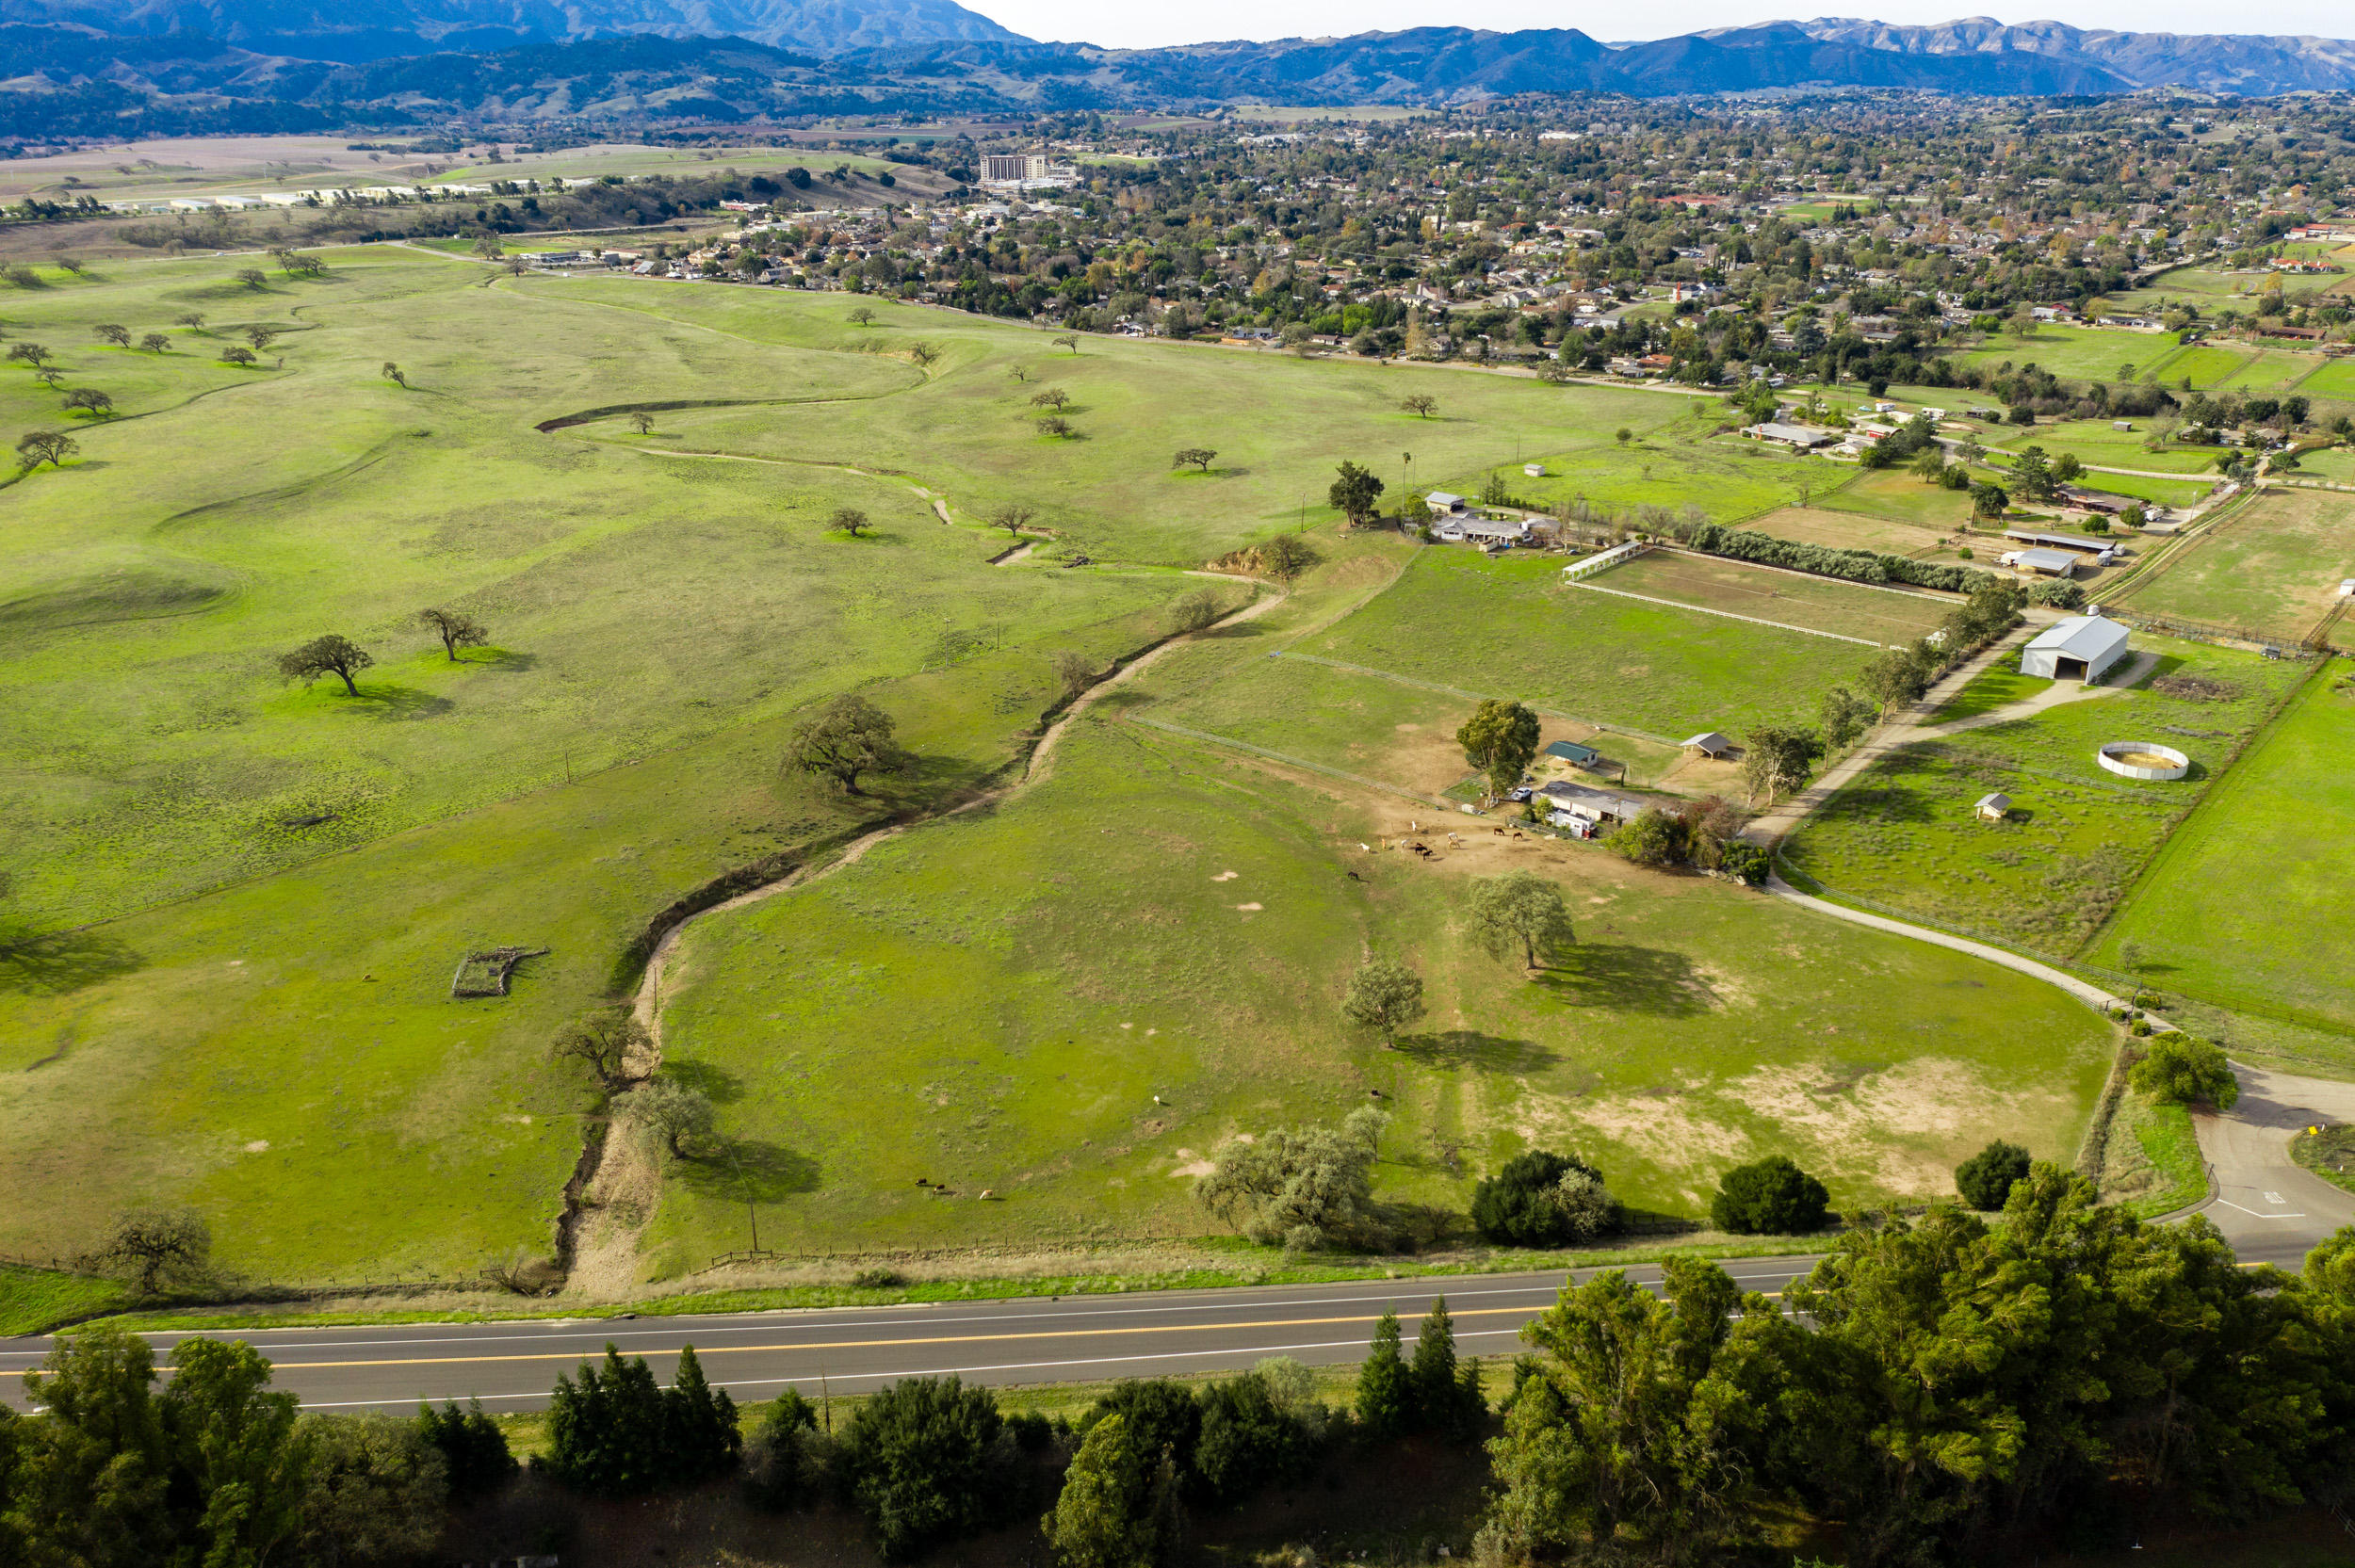 1460 Meadowvale Road Santa Ynez, CA 93460